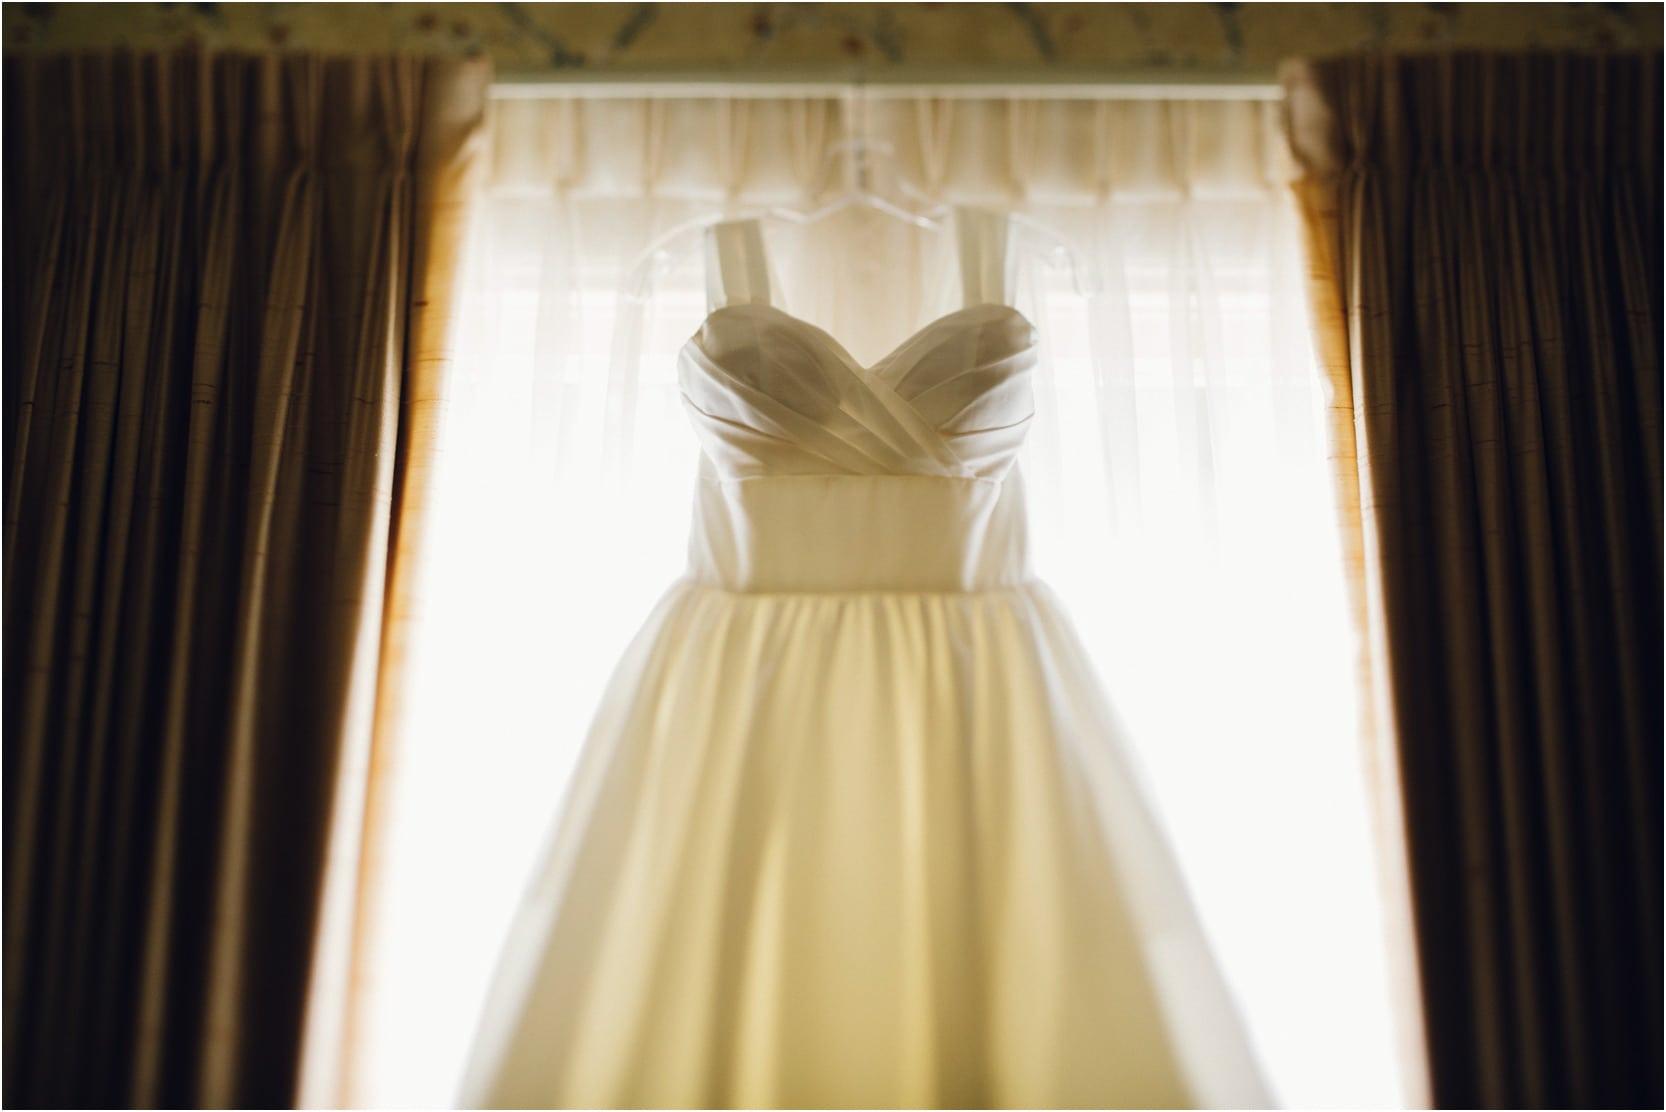 lakecharles_wedding_piperackhoury_19